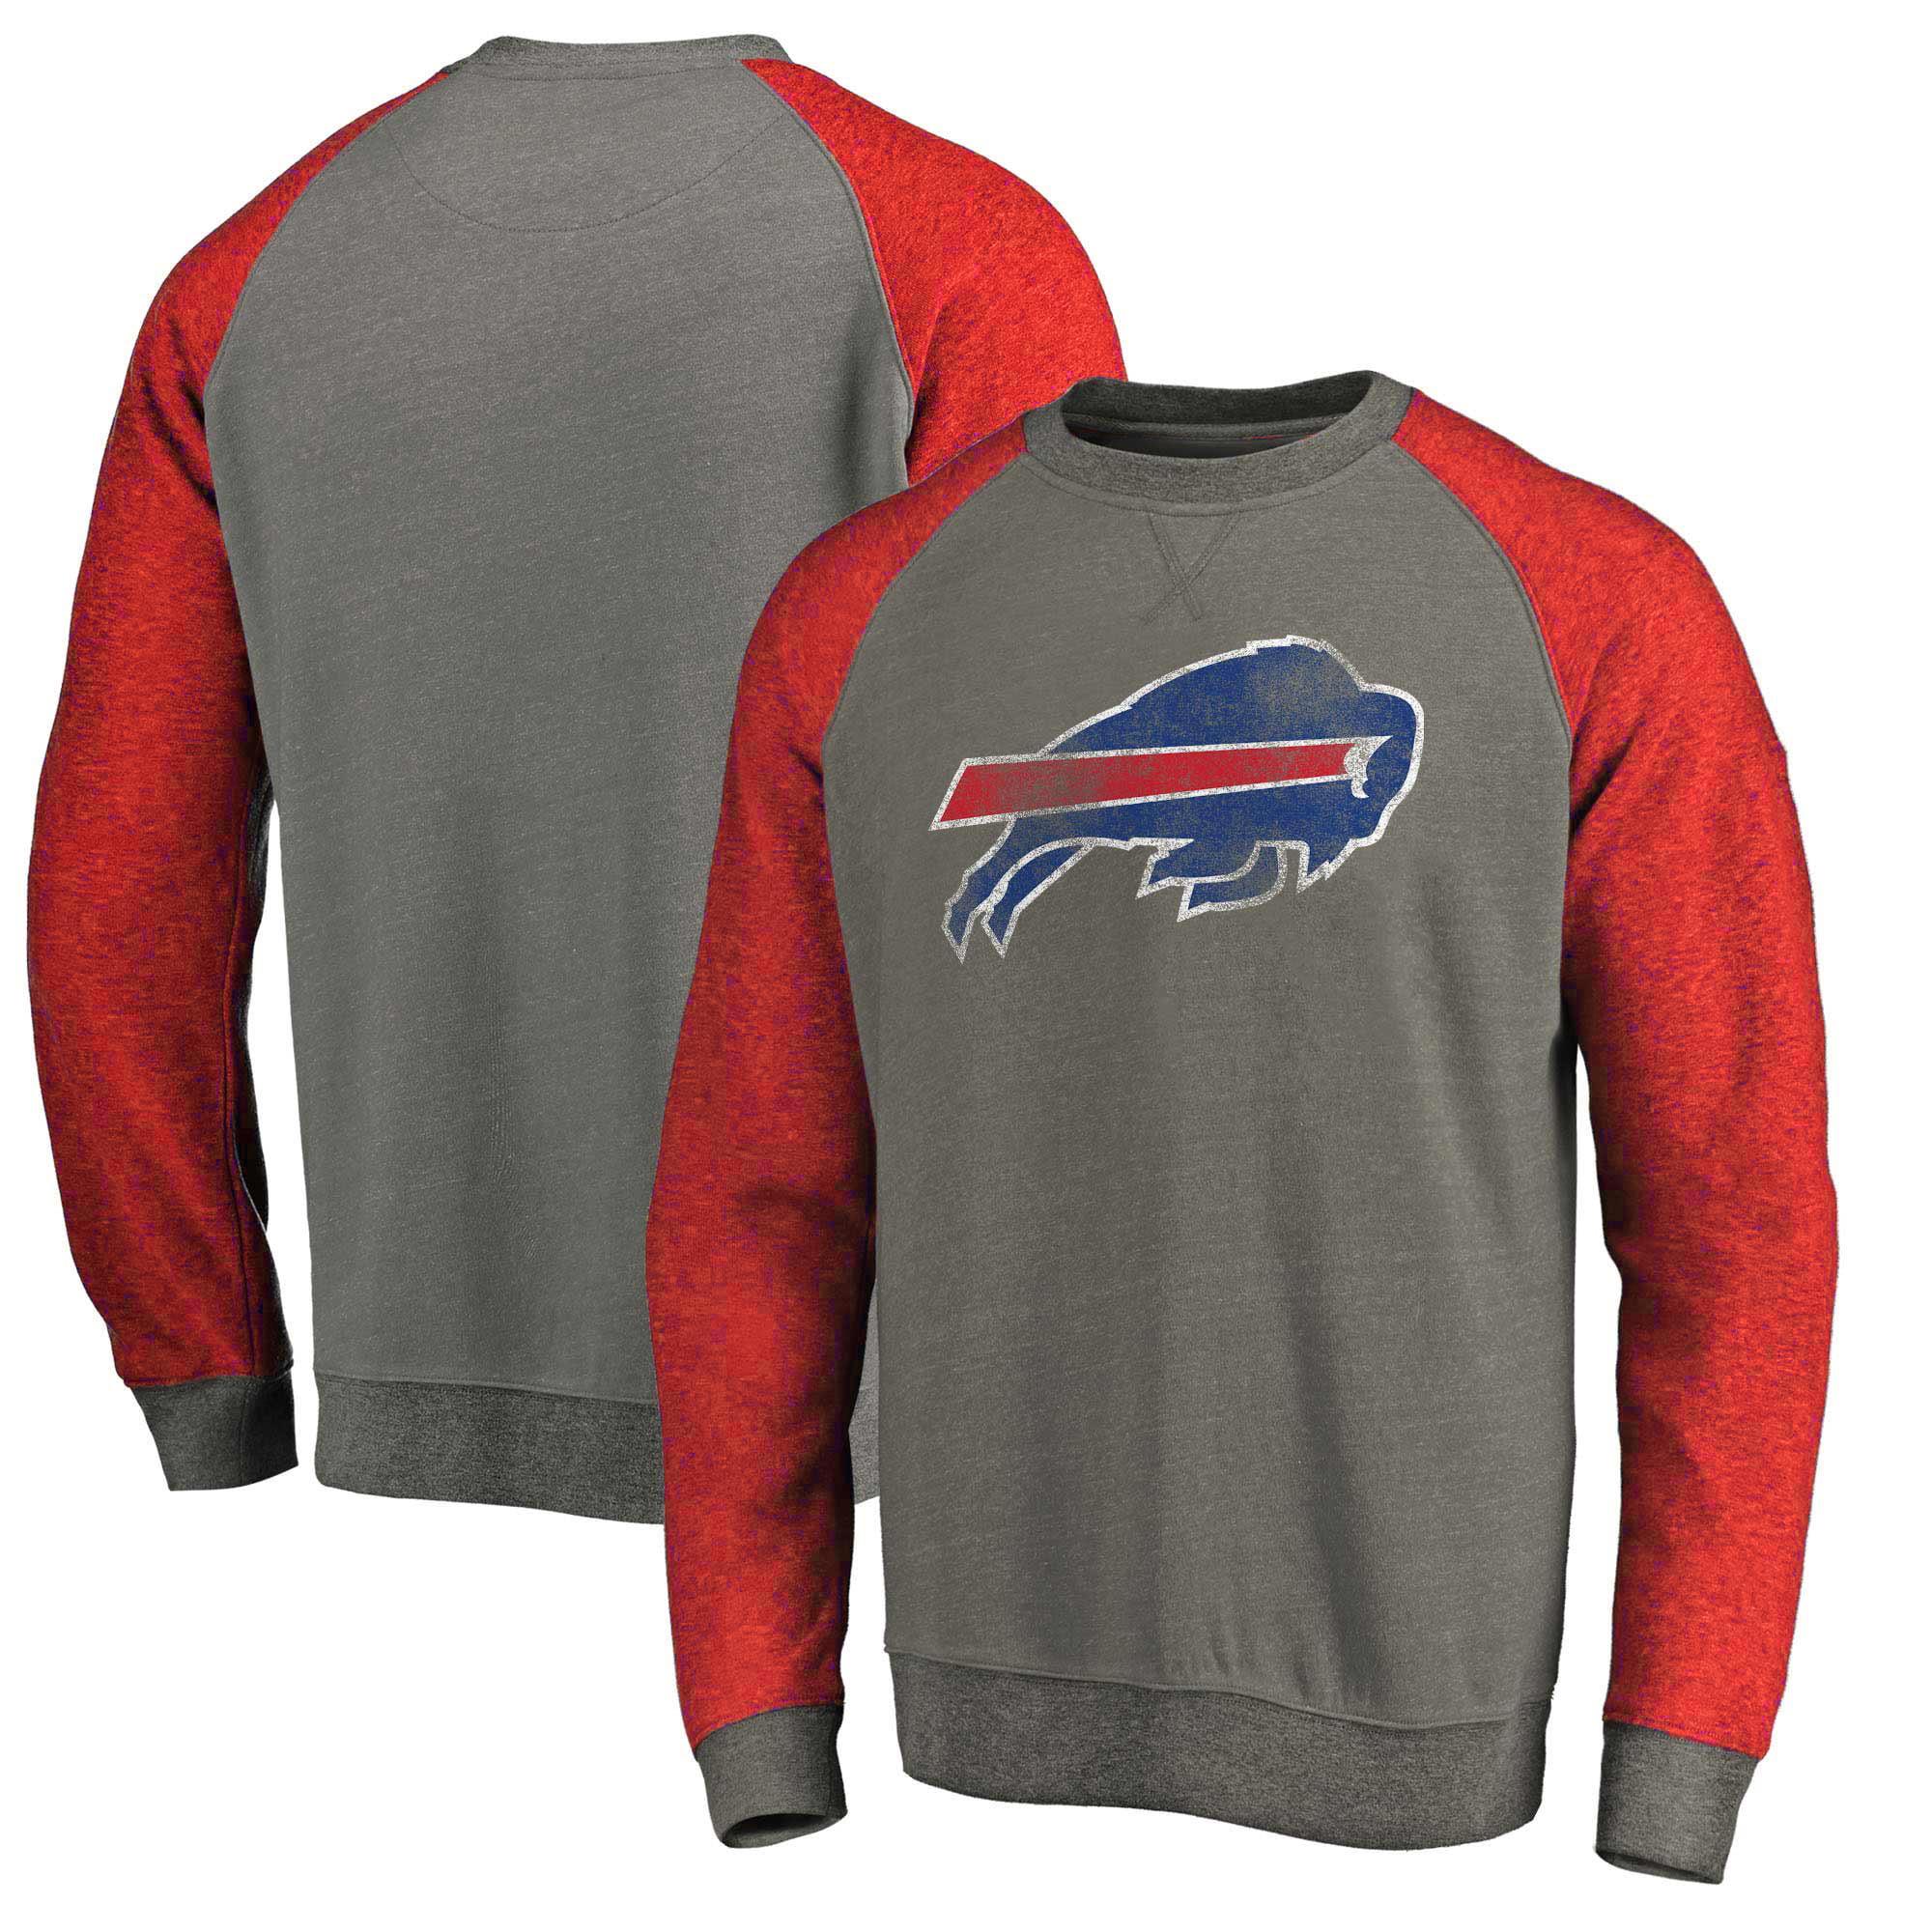 Buffalo Bills NFL Pro Line by Fanatics Branded Distressed Team Tri-Blend Pullover Sweatshirt - Heathered Gray/Red